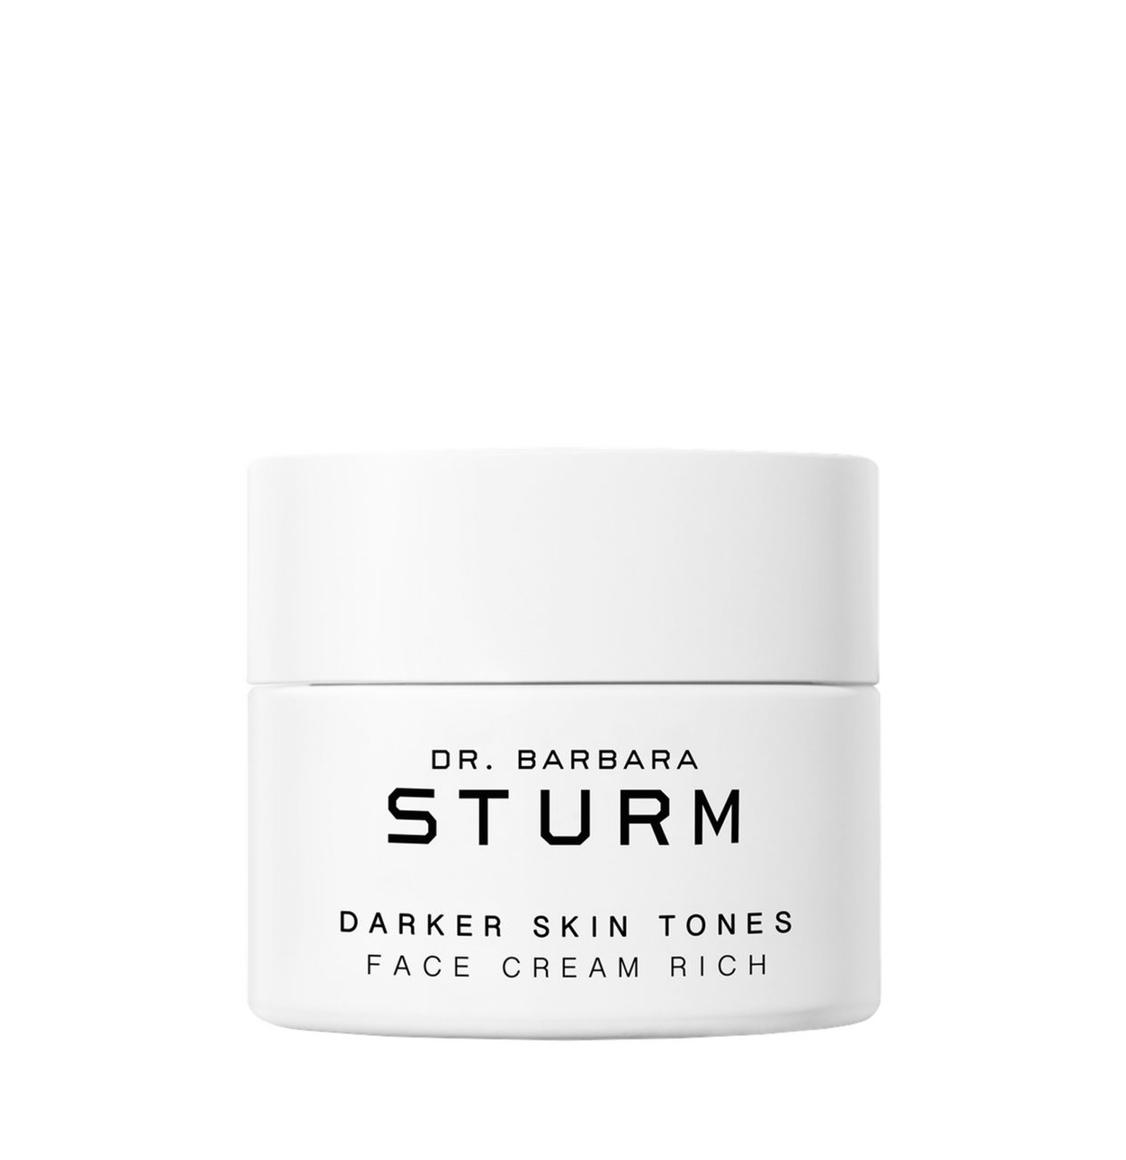 Dr. Barbara Sturm Darker Skin Tones Face Cream Rich 50ml